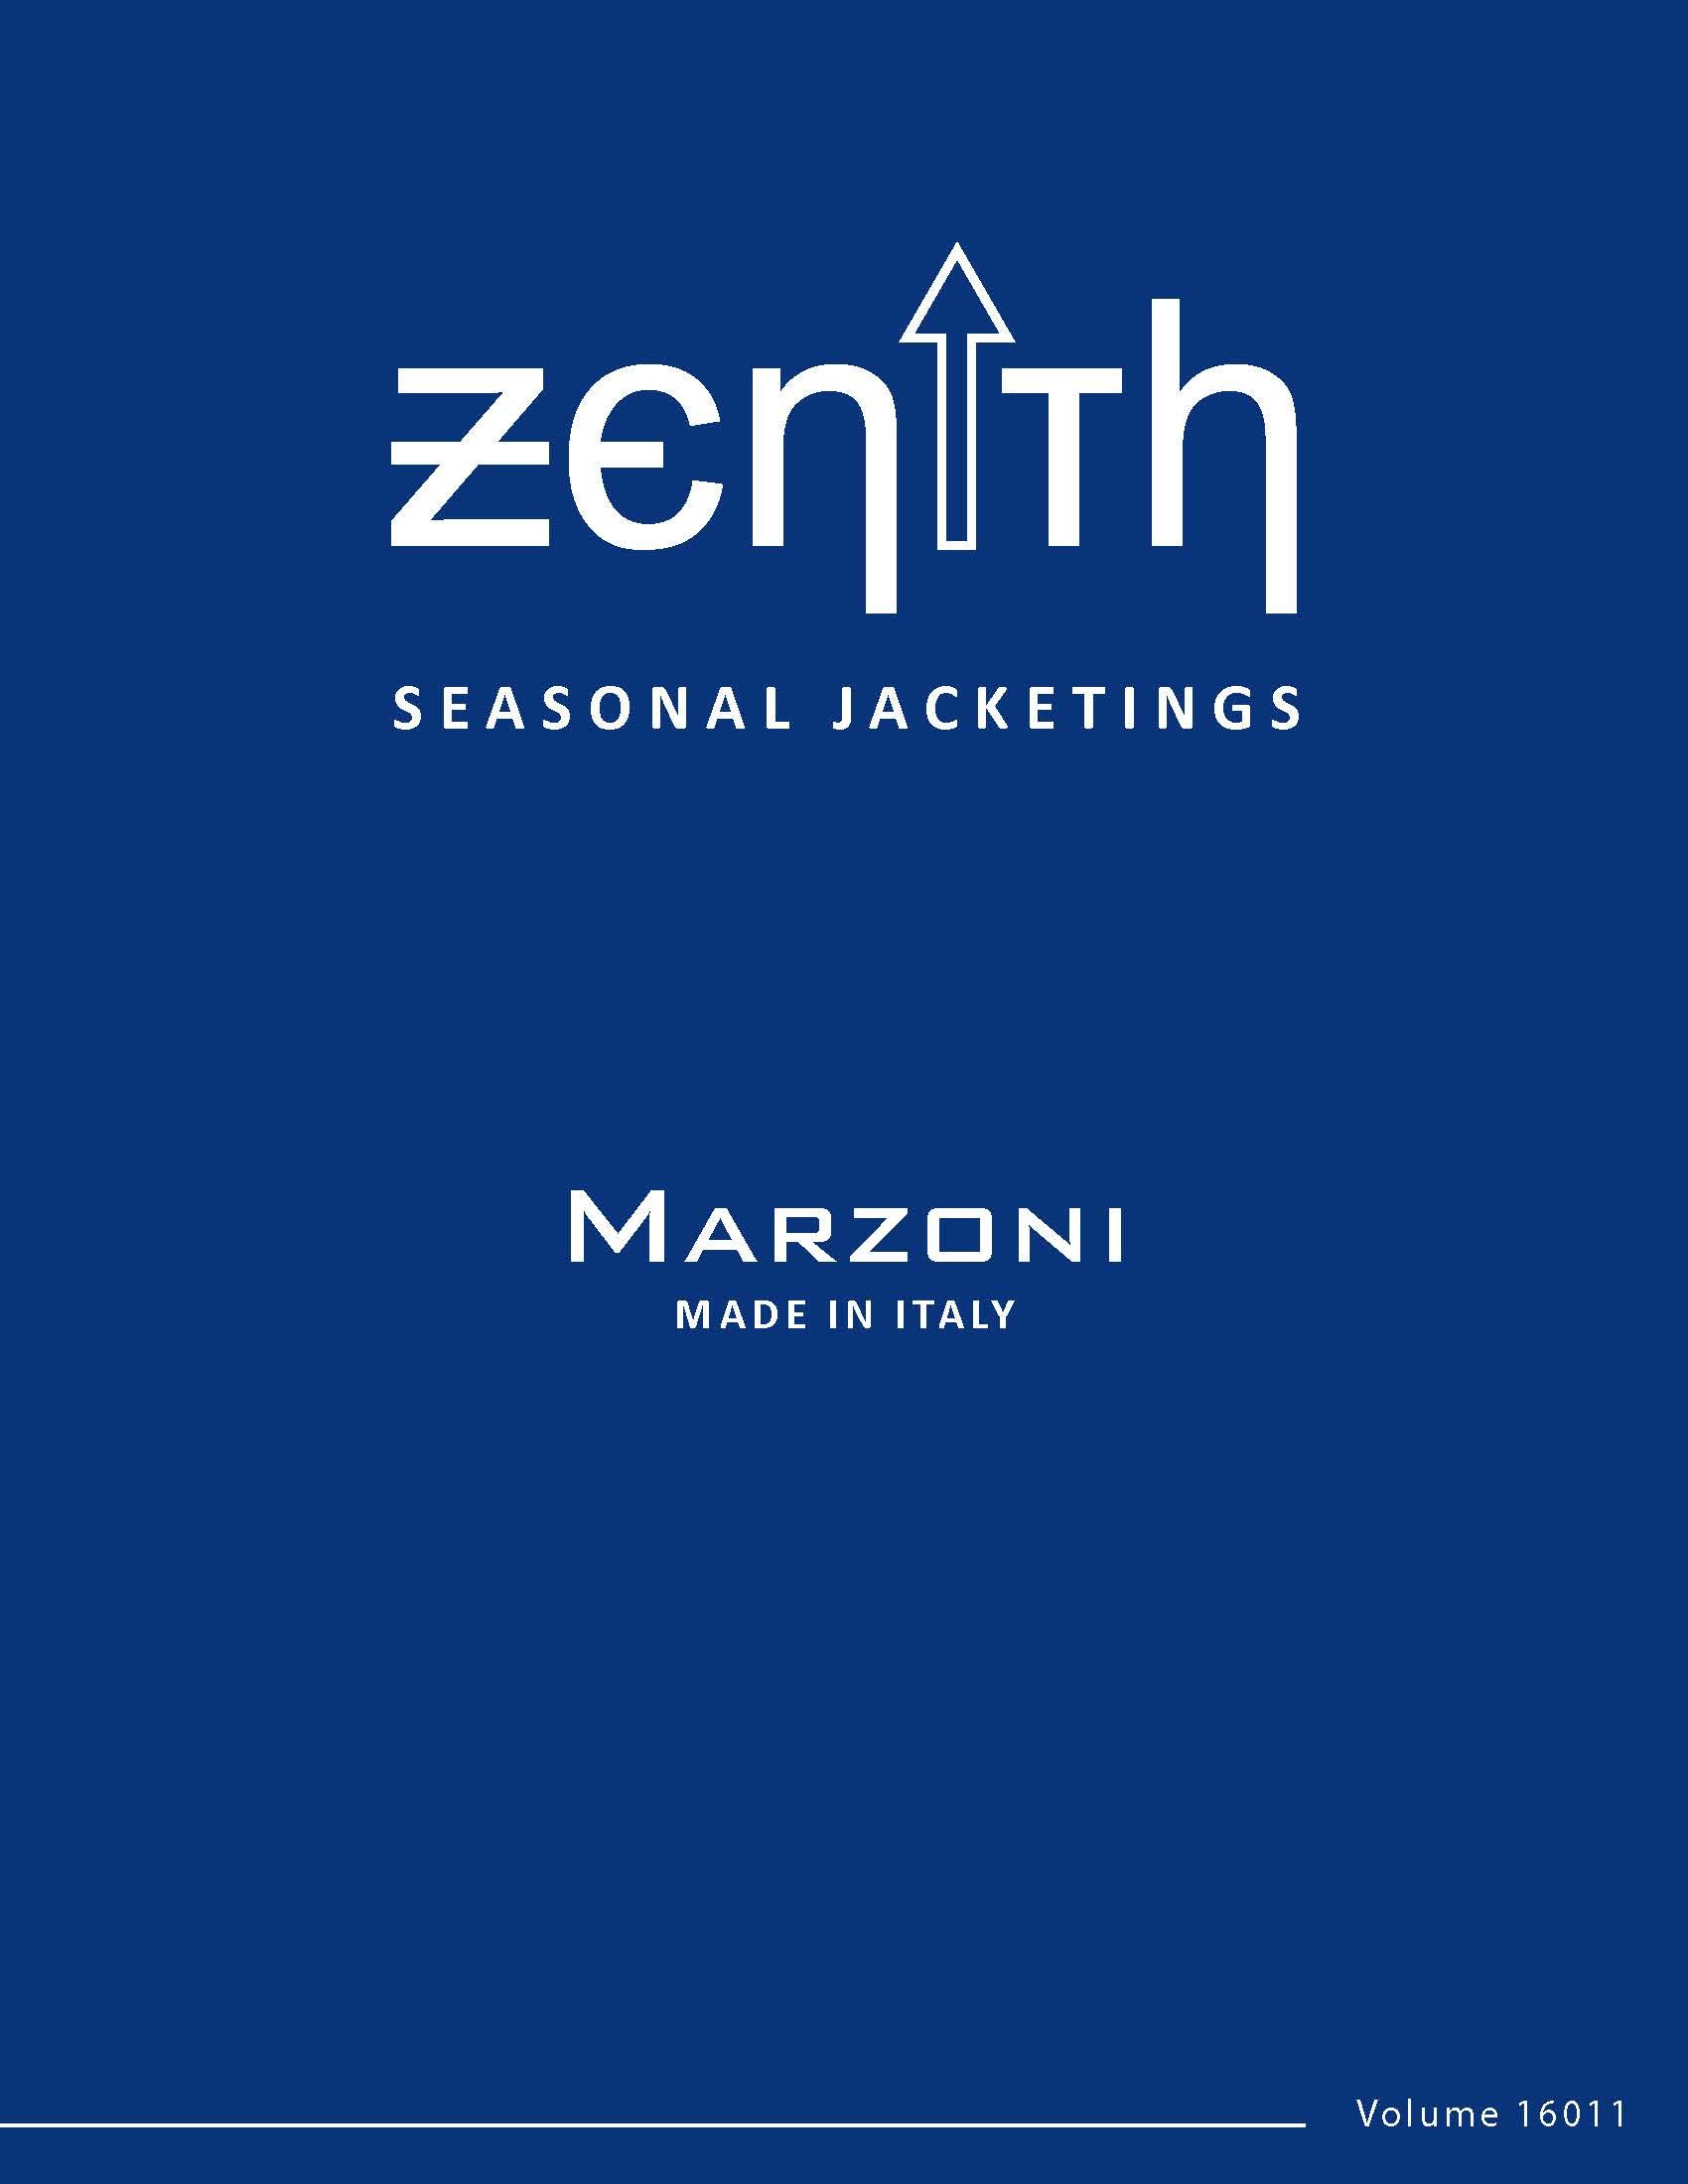 Zenith_Seasonal_Jacketings_V16011__Marzoni_.jpg